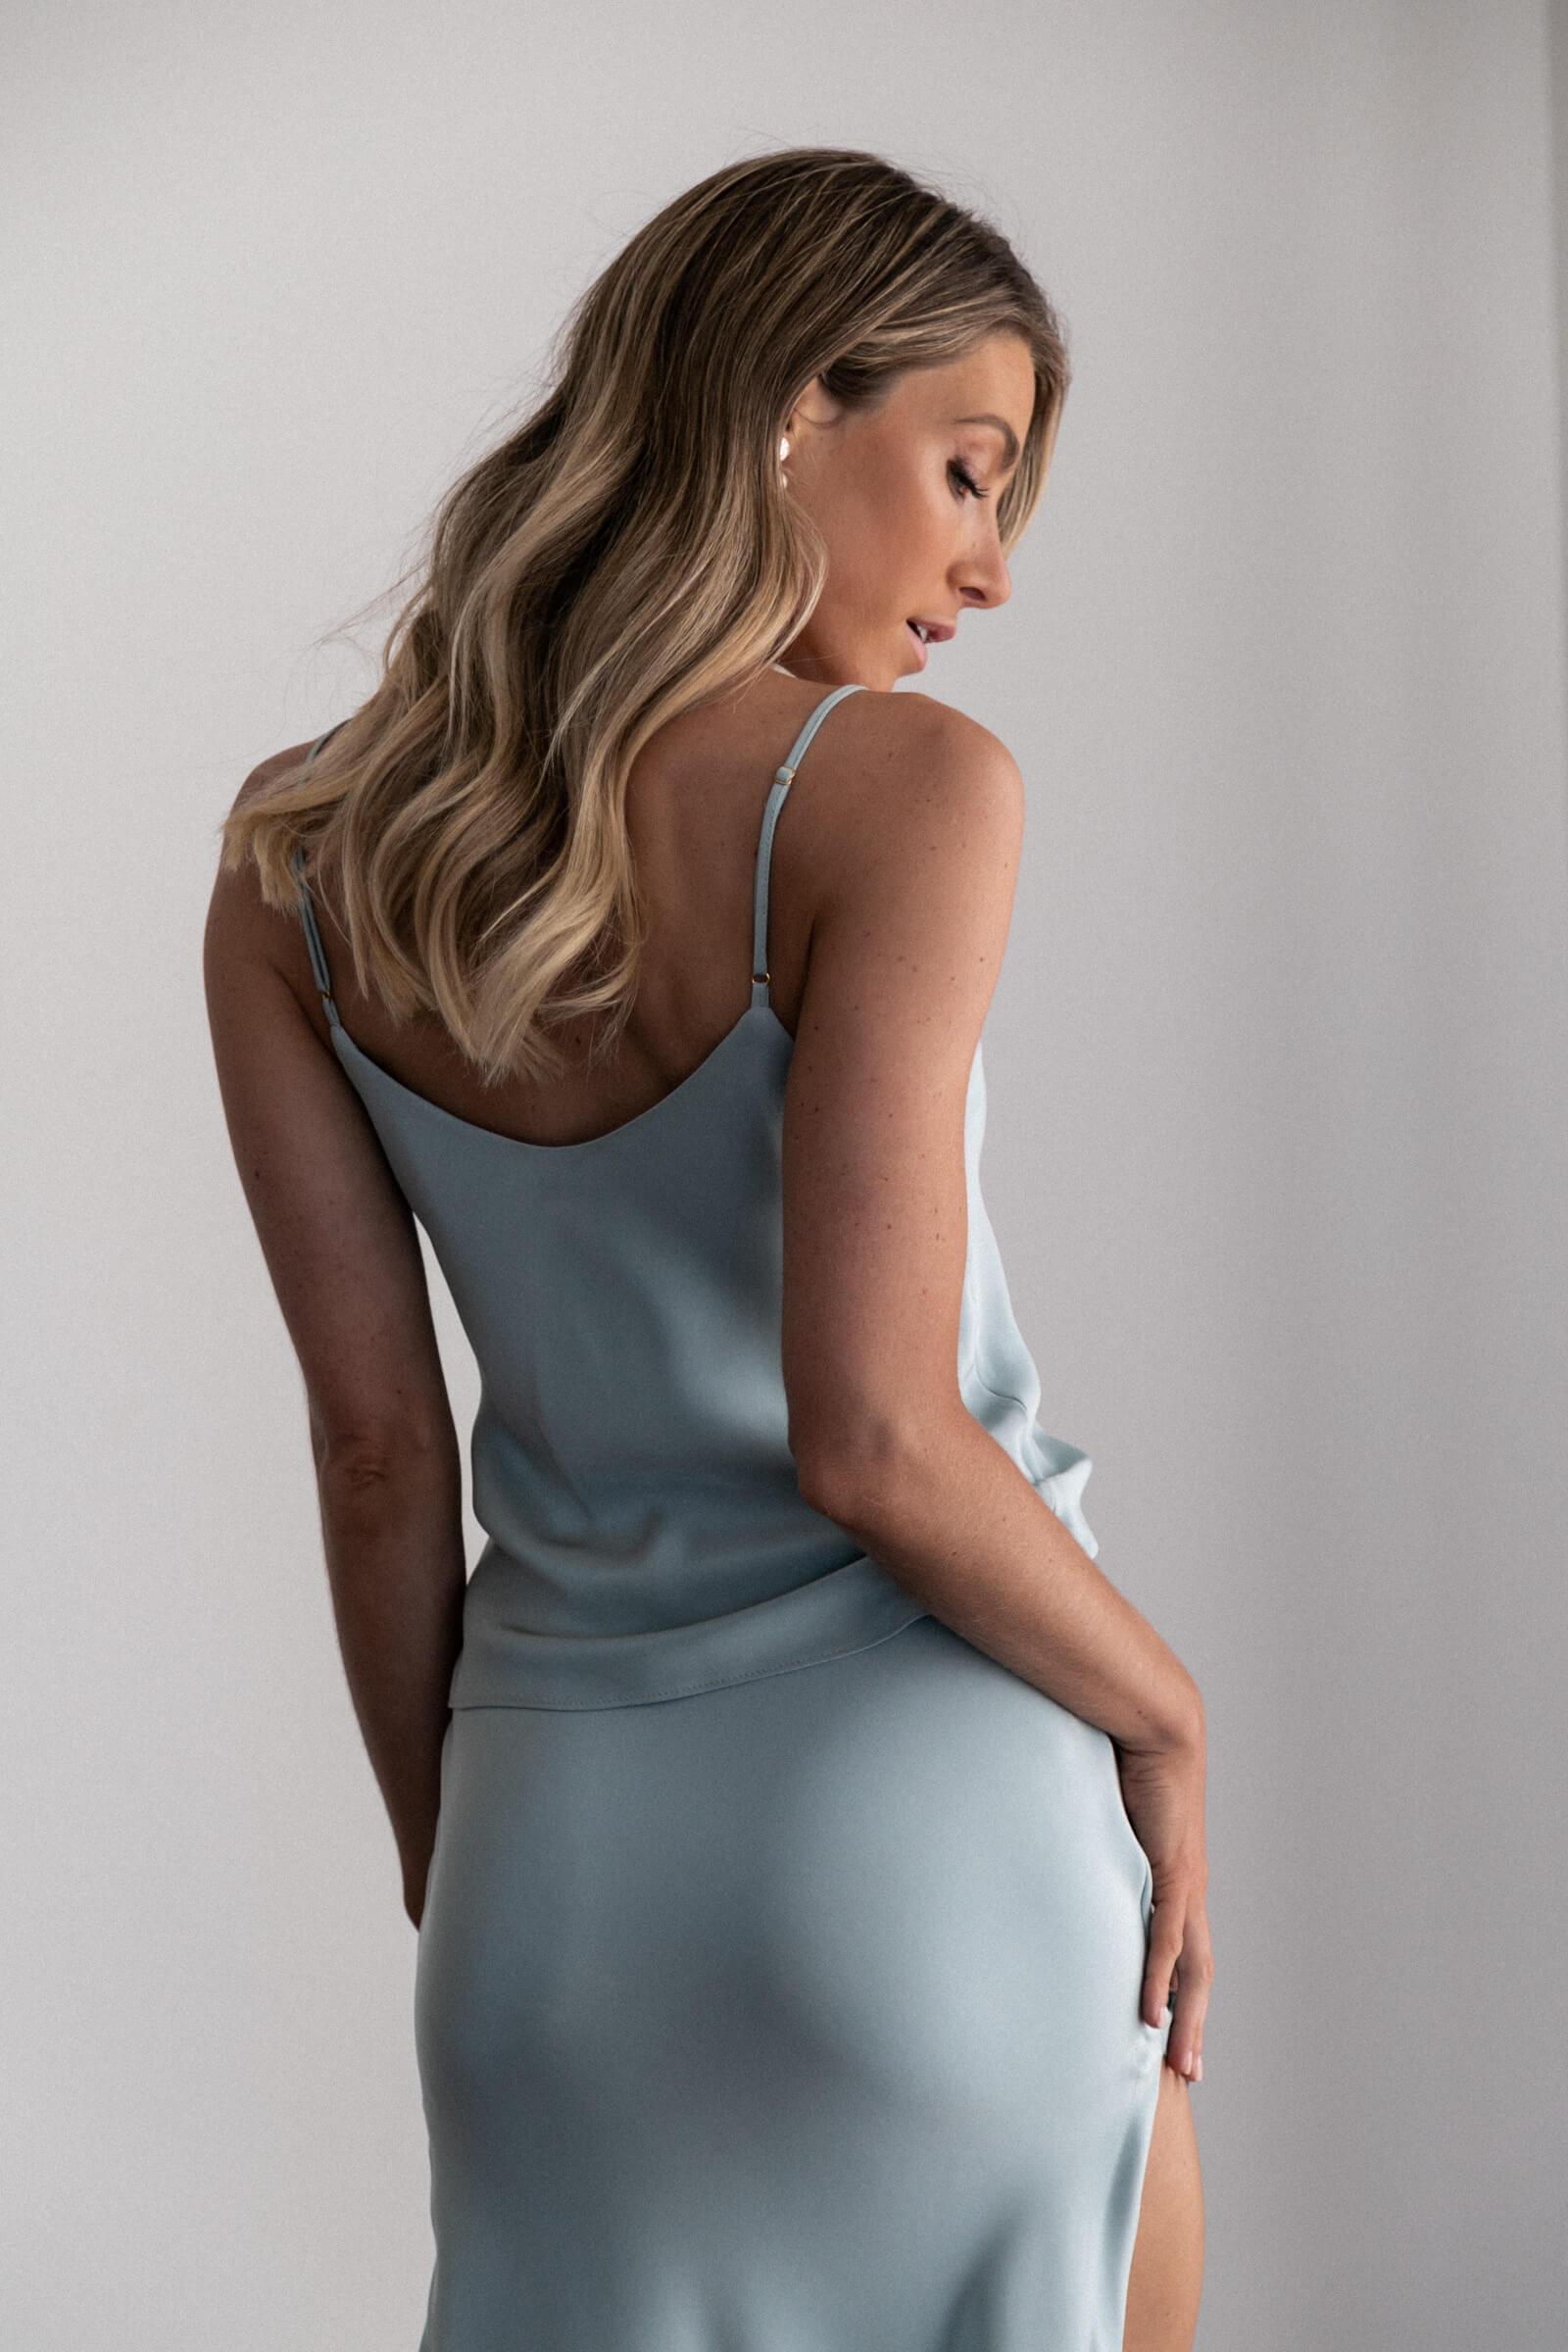 Cheap Sheath Bridesmaid Dresses 2020 Satin Side Slit Spaghetti Straps Vestido De Festa Robe Demoiselle D'Honneur